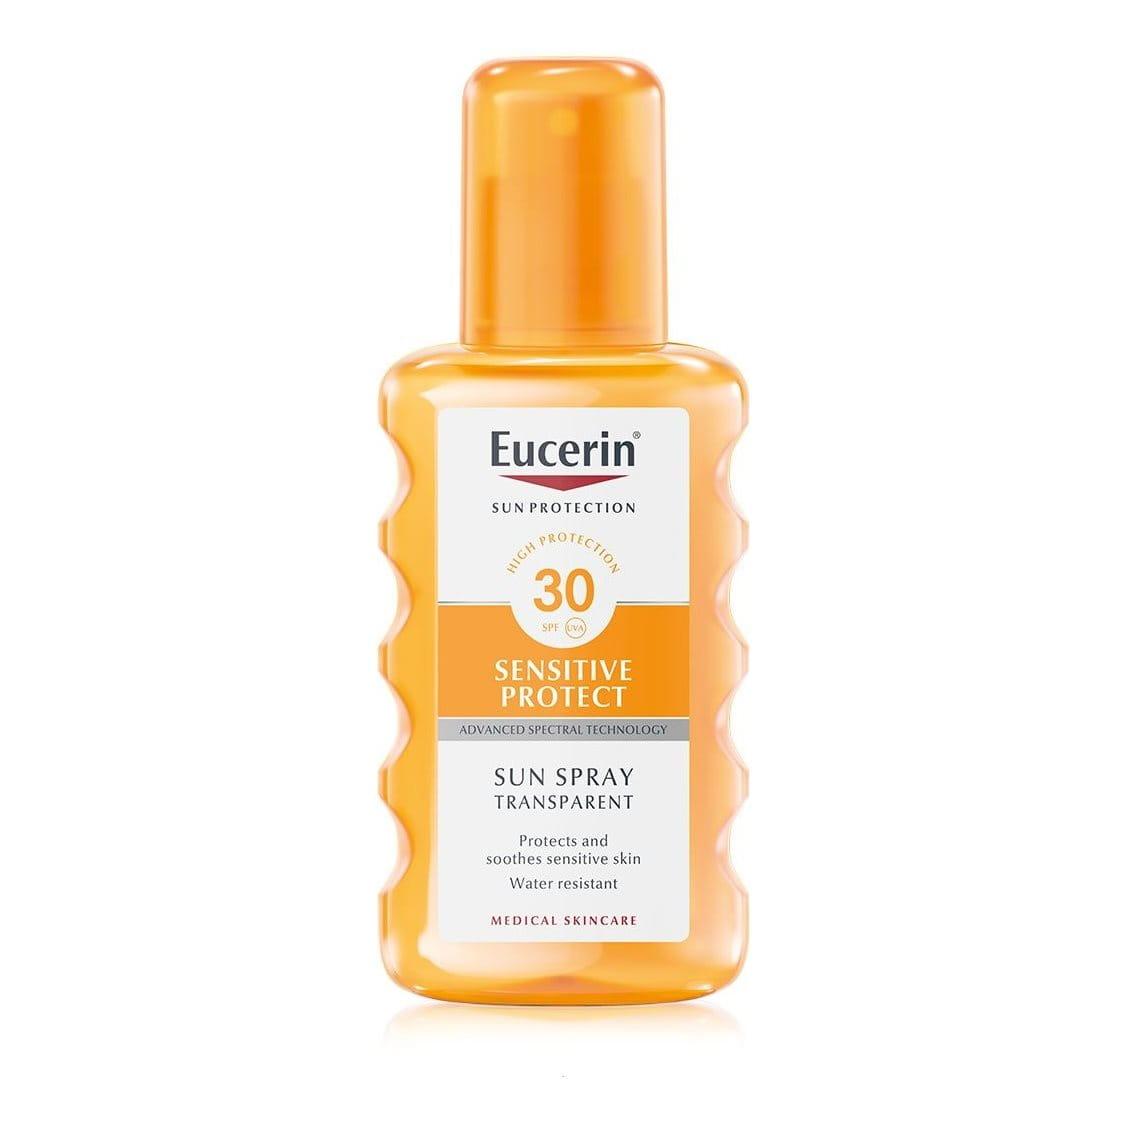 Eucerin Sun Spray Transparent Sensitive Protect SPF30